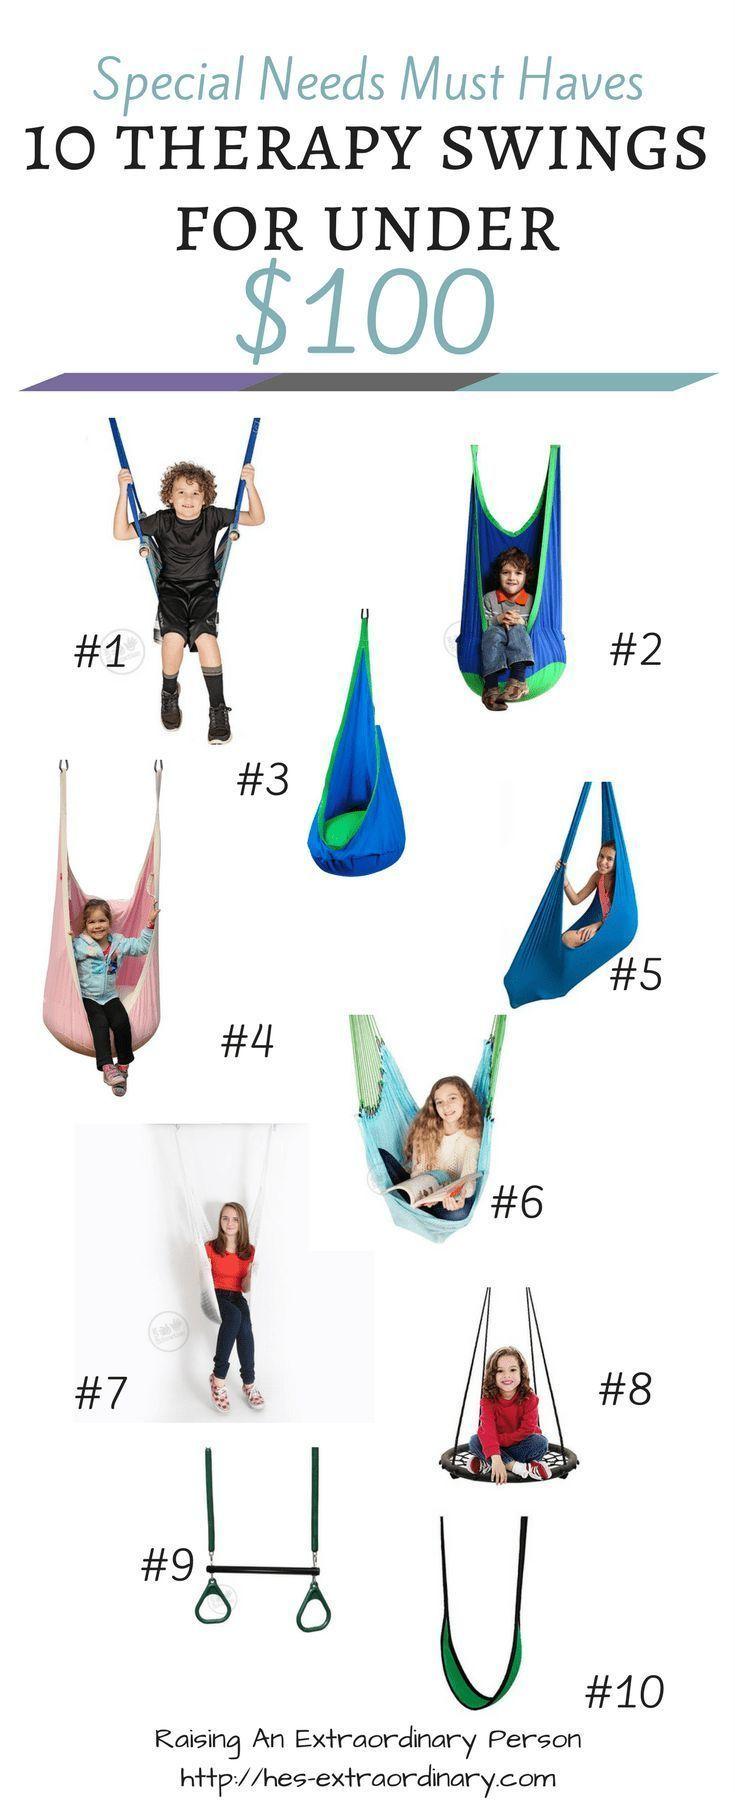 Benefits of Swinging , Sensory Integration, Proprioception, Vestibular Input, Sensory Activities, Autism, ADHD, SPD